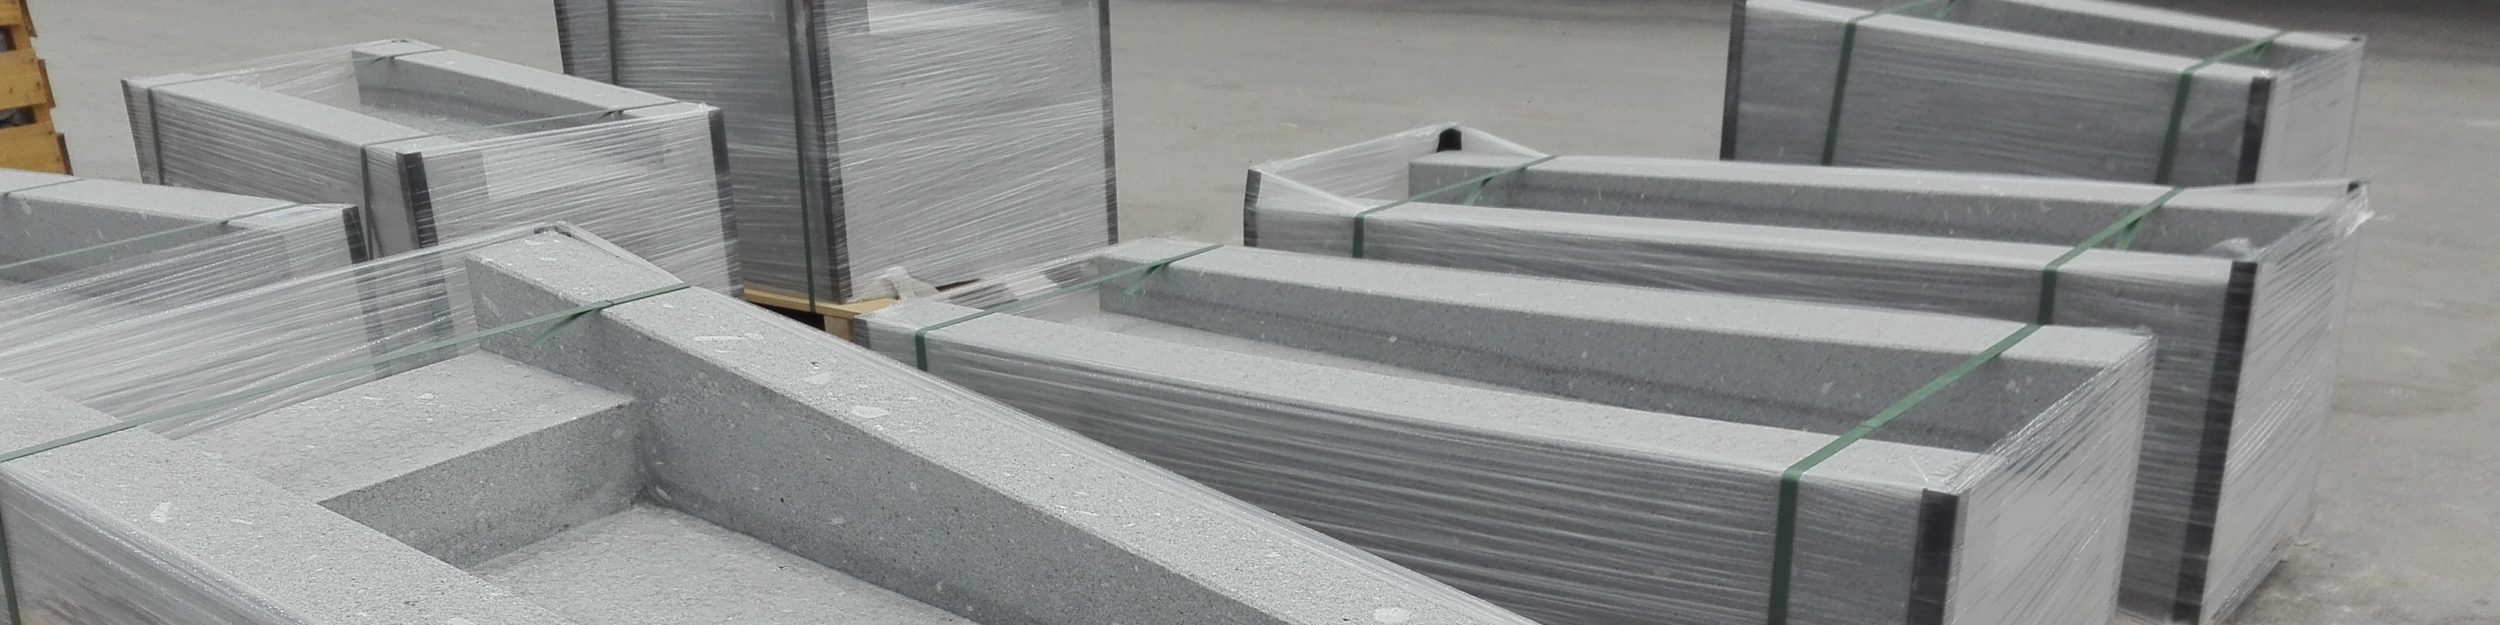 KIED GmbH